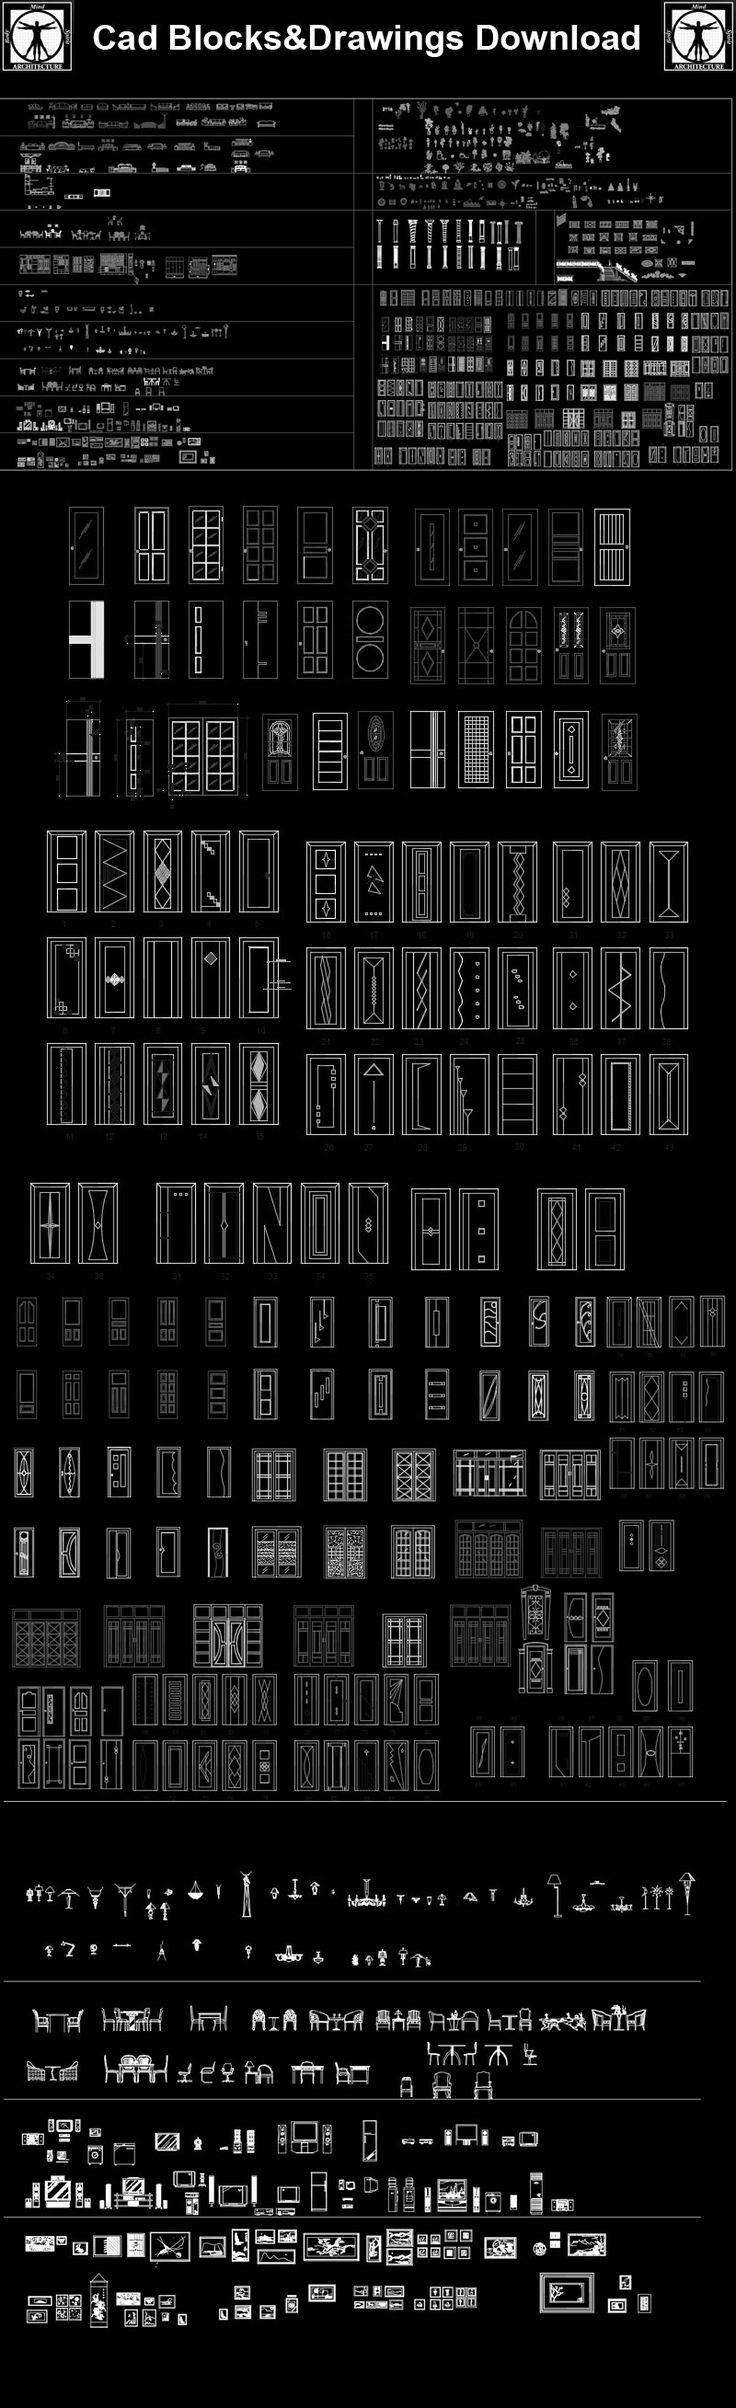 Furniture Blocks,Furniture elevation,Door and window design,Architecture Decoration Drawing,Decorative Elements,Architecture Decoration Drawing,Architecture Decor,Interior, Decorating,Modern Architecture,Decoration